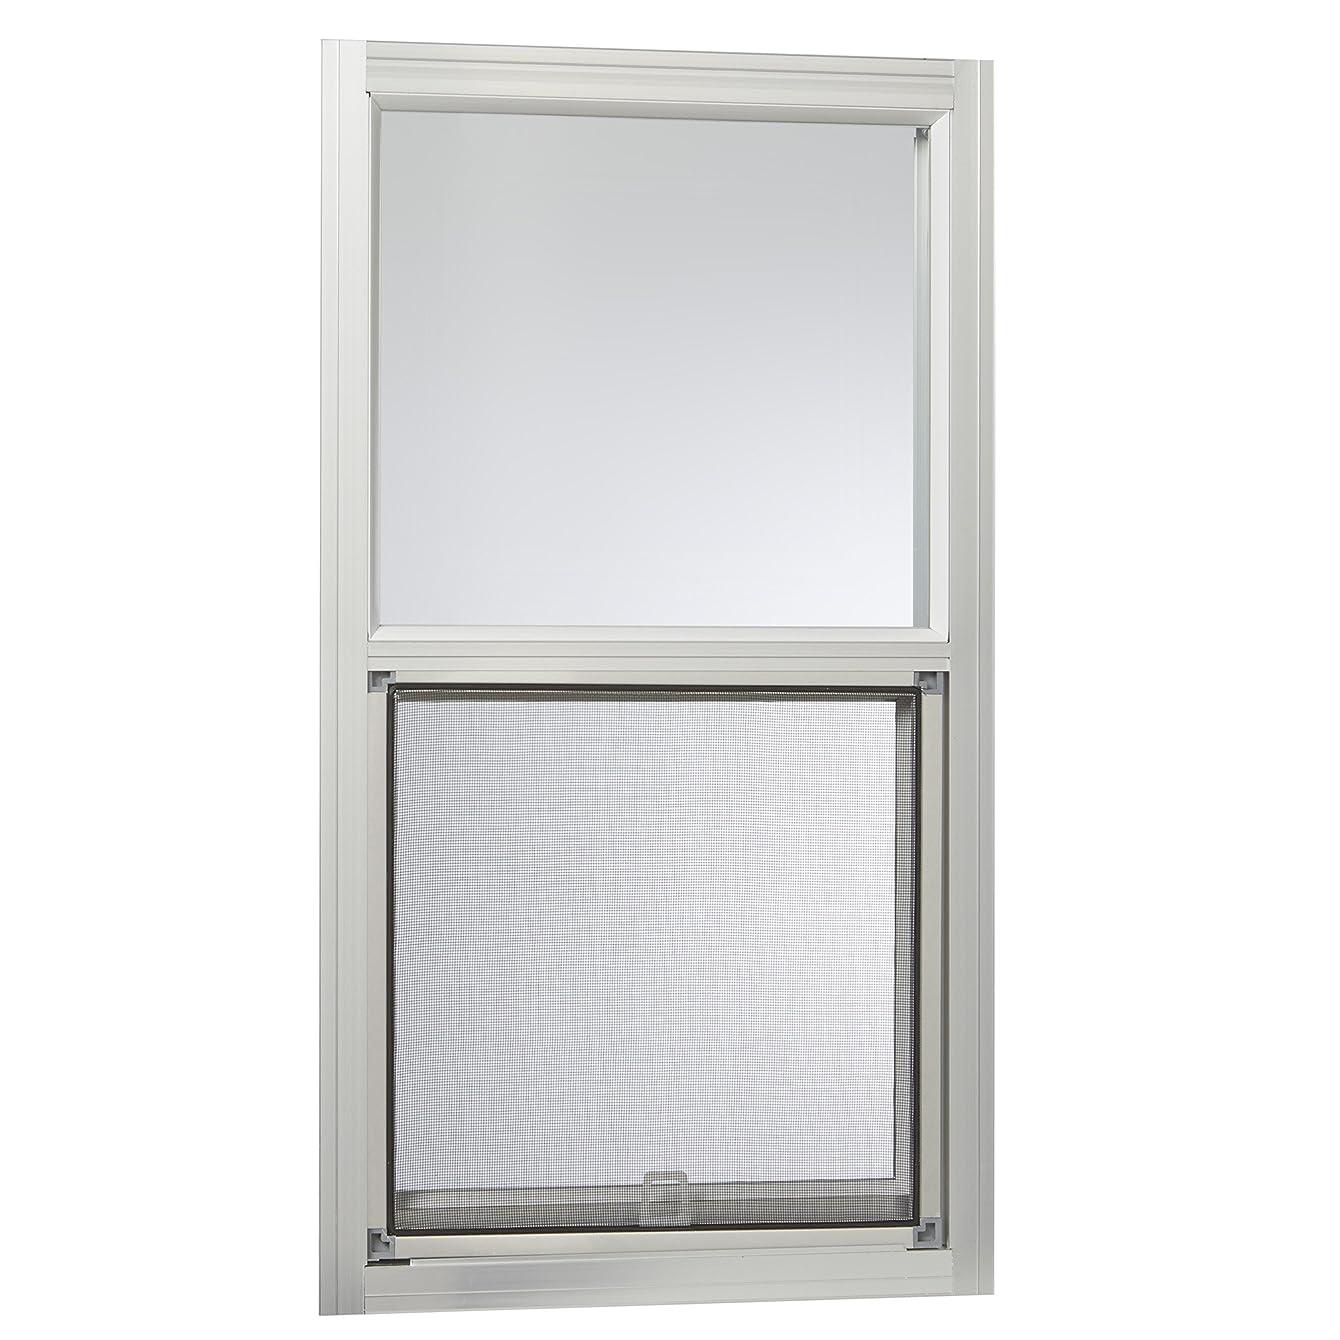 Park Ridge Products AMHMF1427PR Park Ridge Mill Finish 14 in. x 27 in. Aluminum Mobile Home Single Hung Window – Silver,